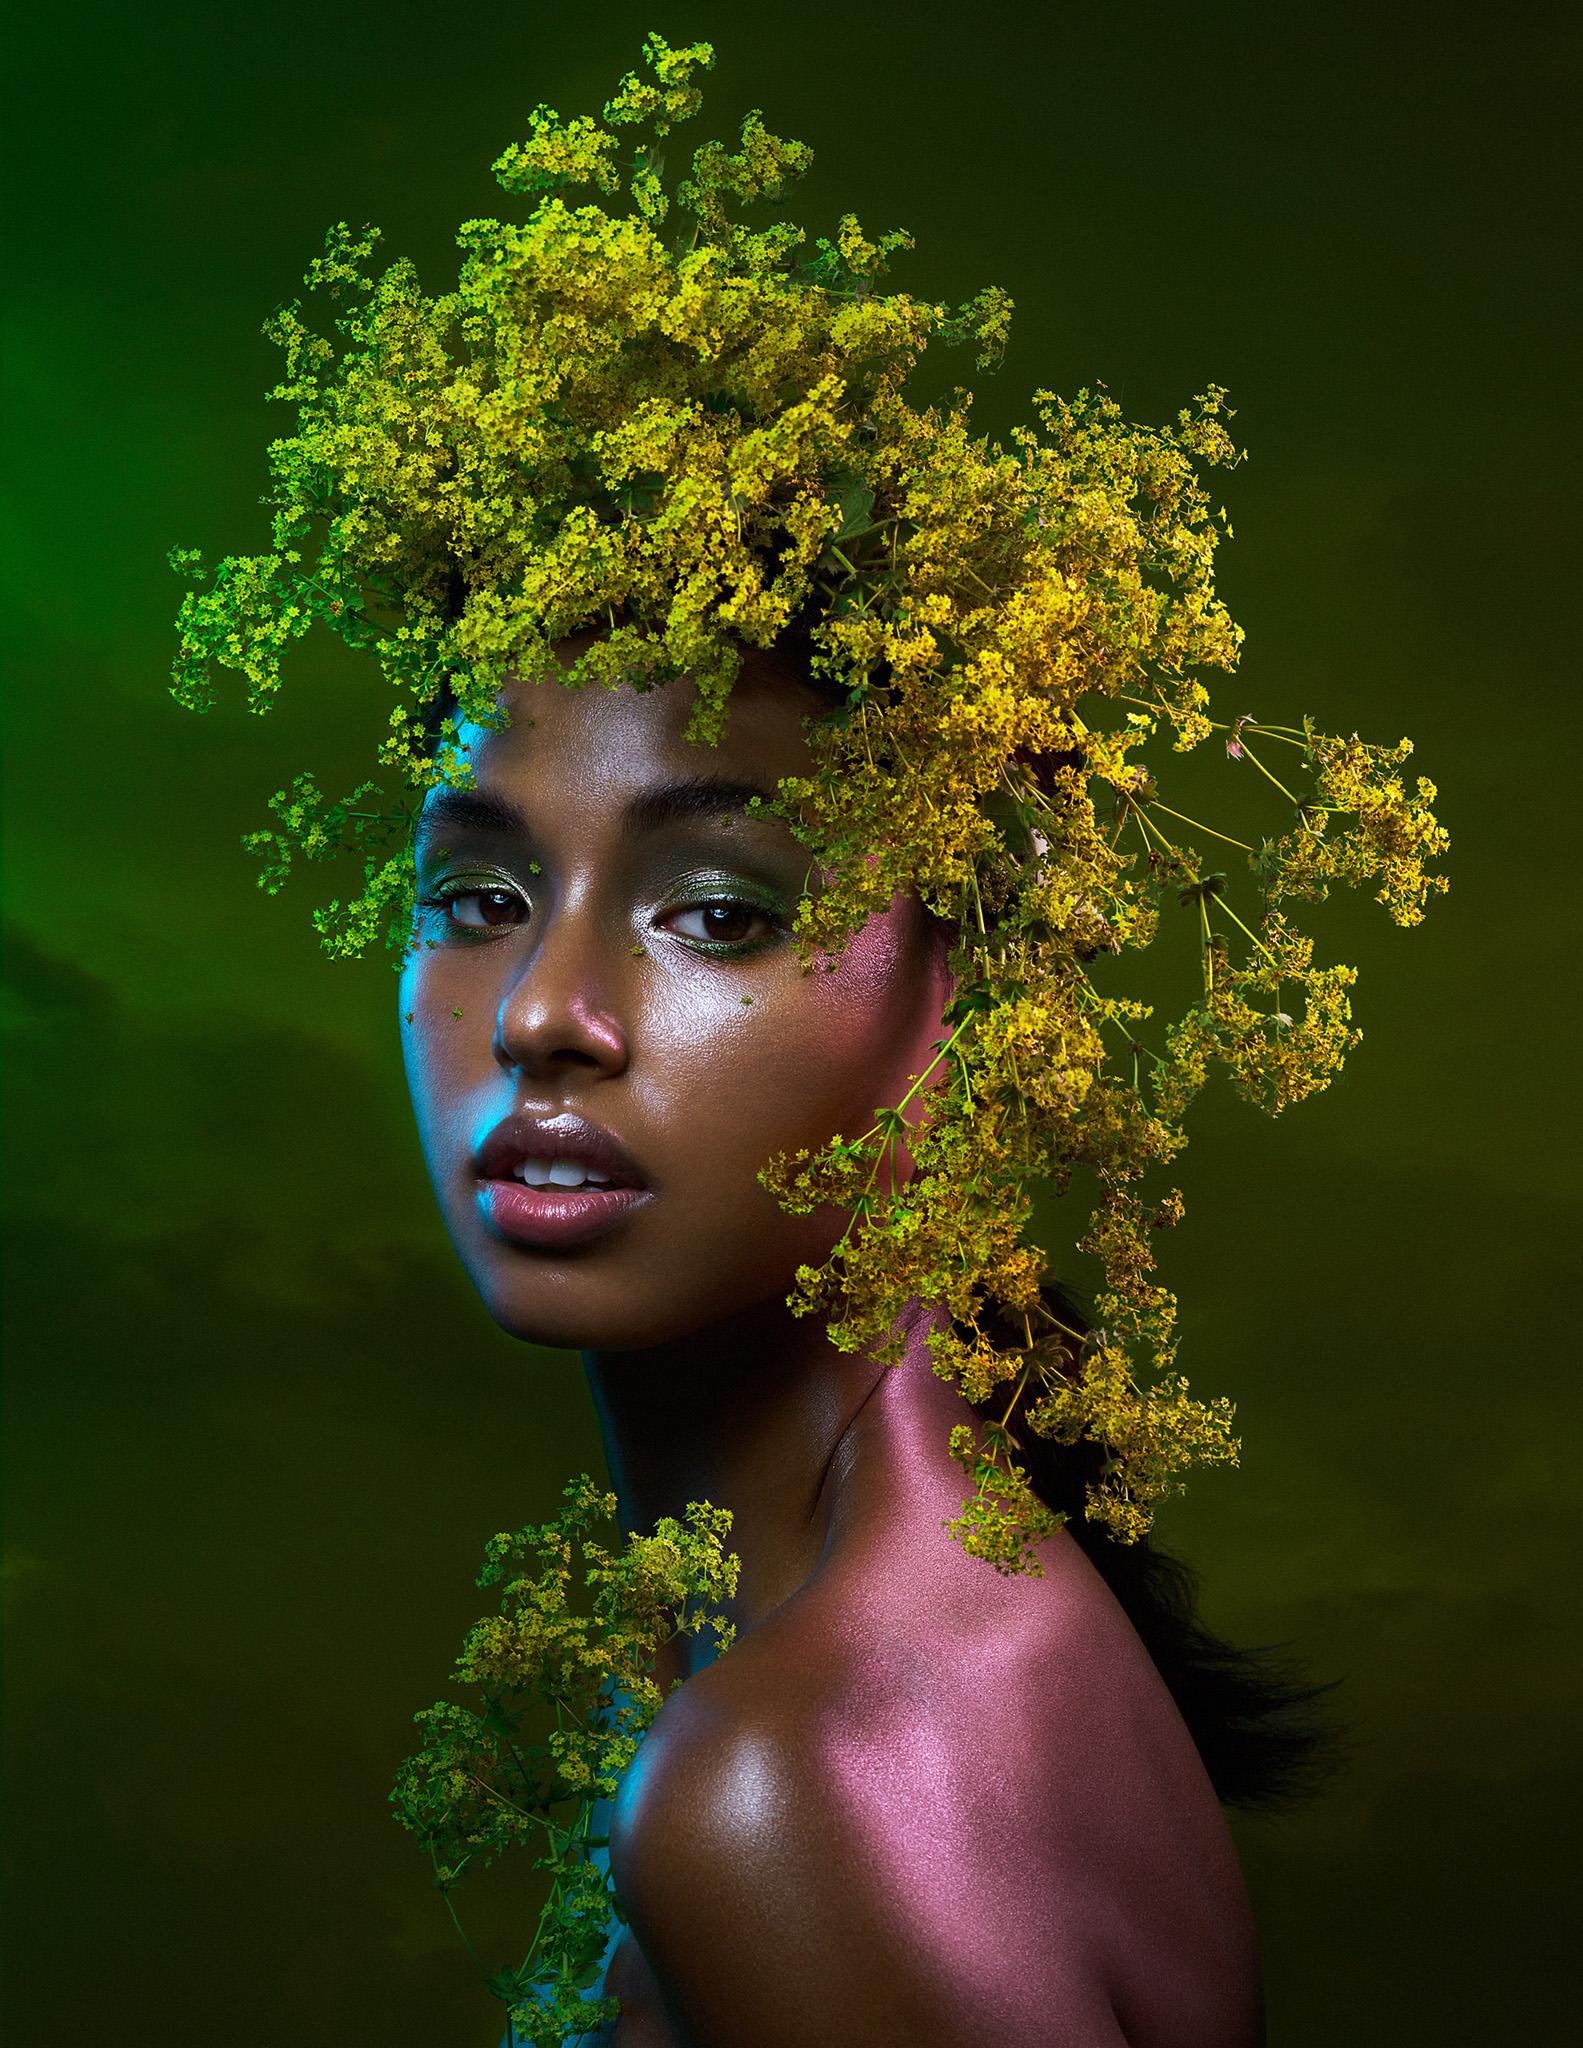 bella-kotak-phase-one-phaseone-profoto-lucysmagazine-profoto-solstice-retouch-beauty-editorial-fashion-mac-cosmetics-glitter-eyes-flower-6